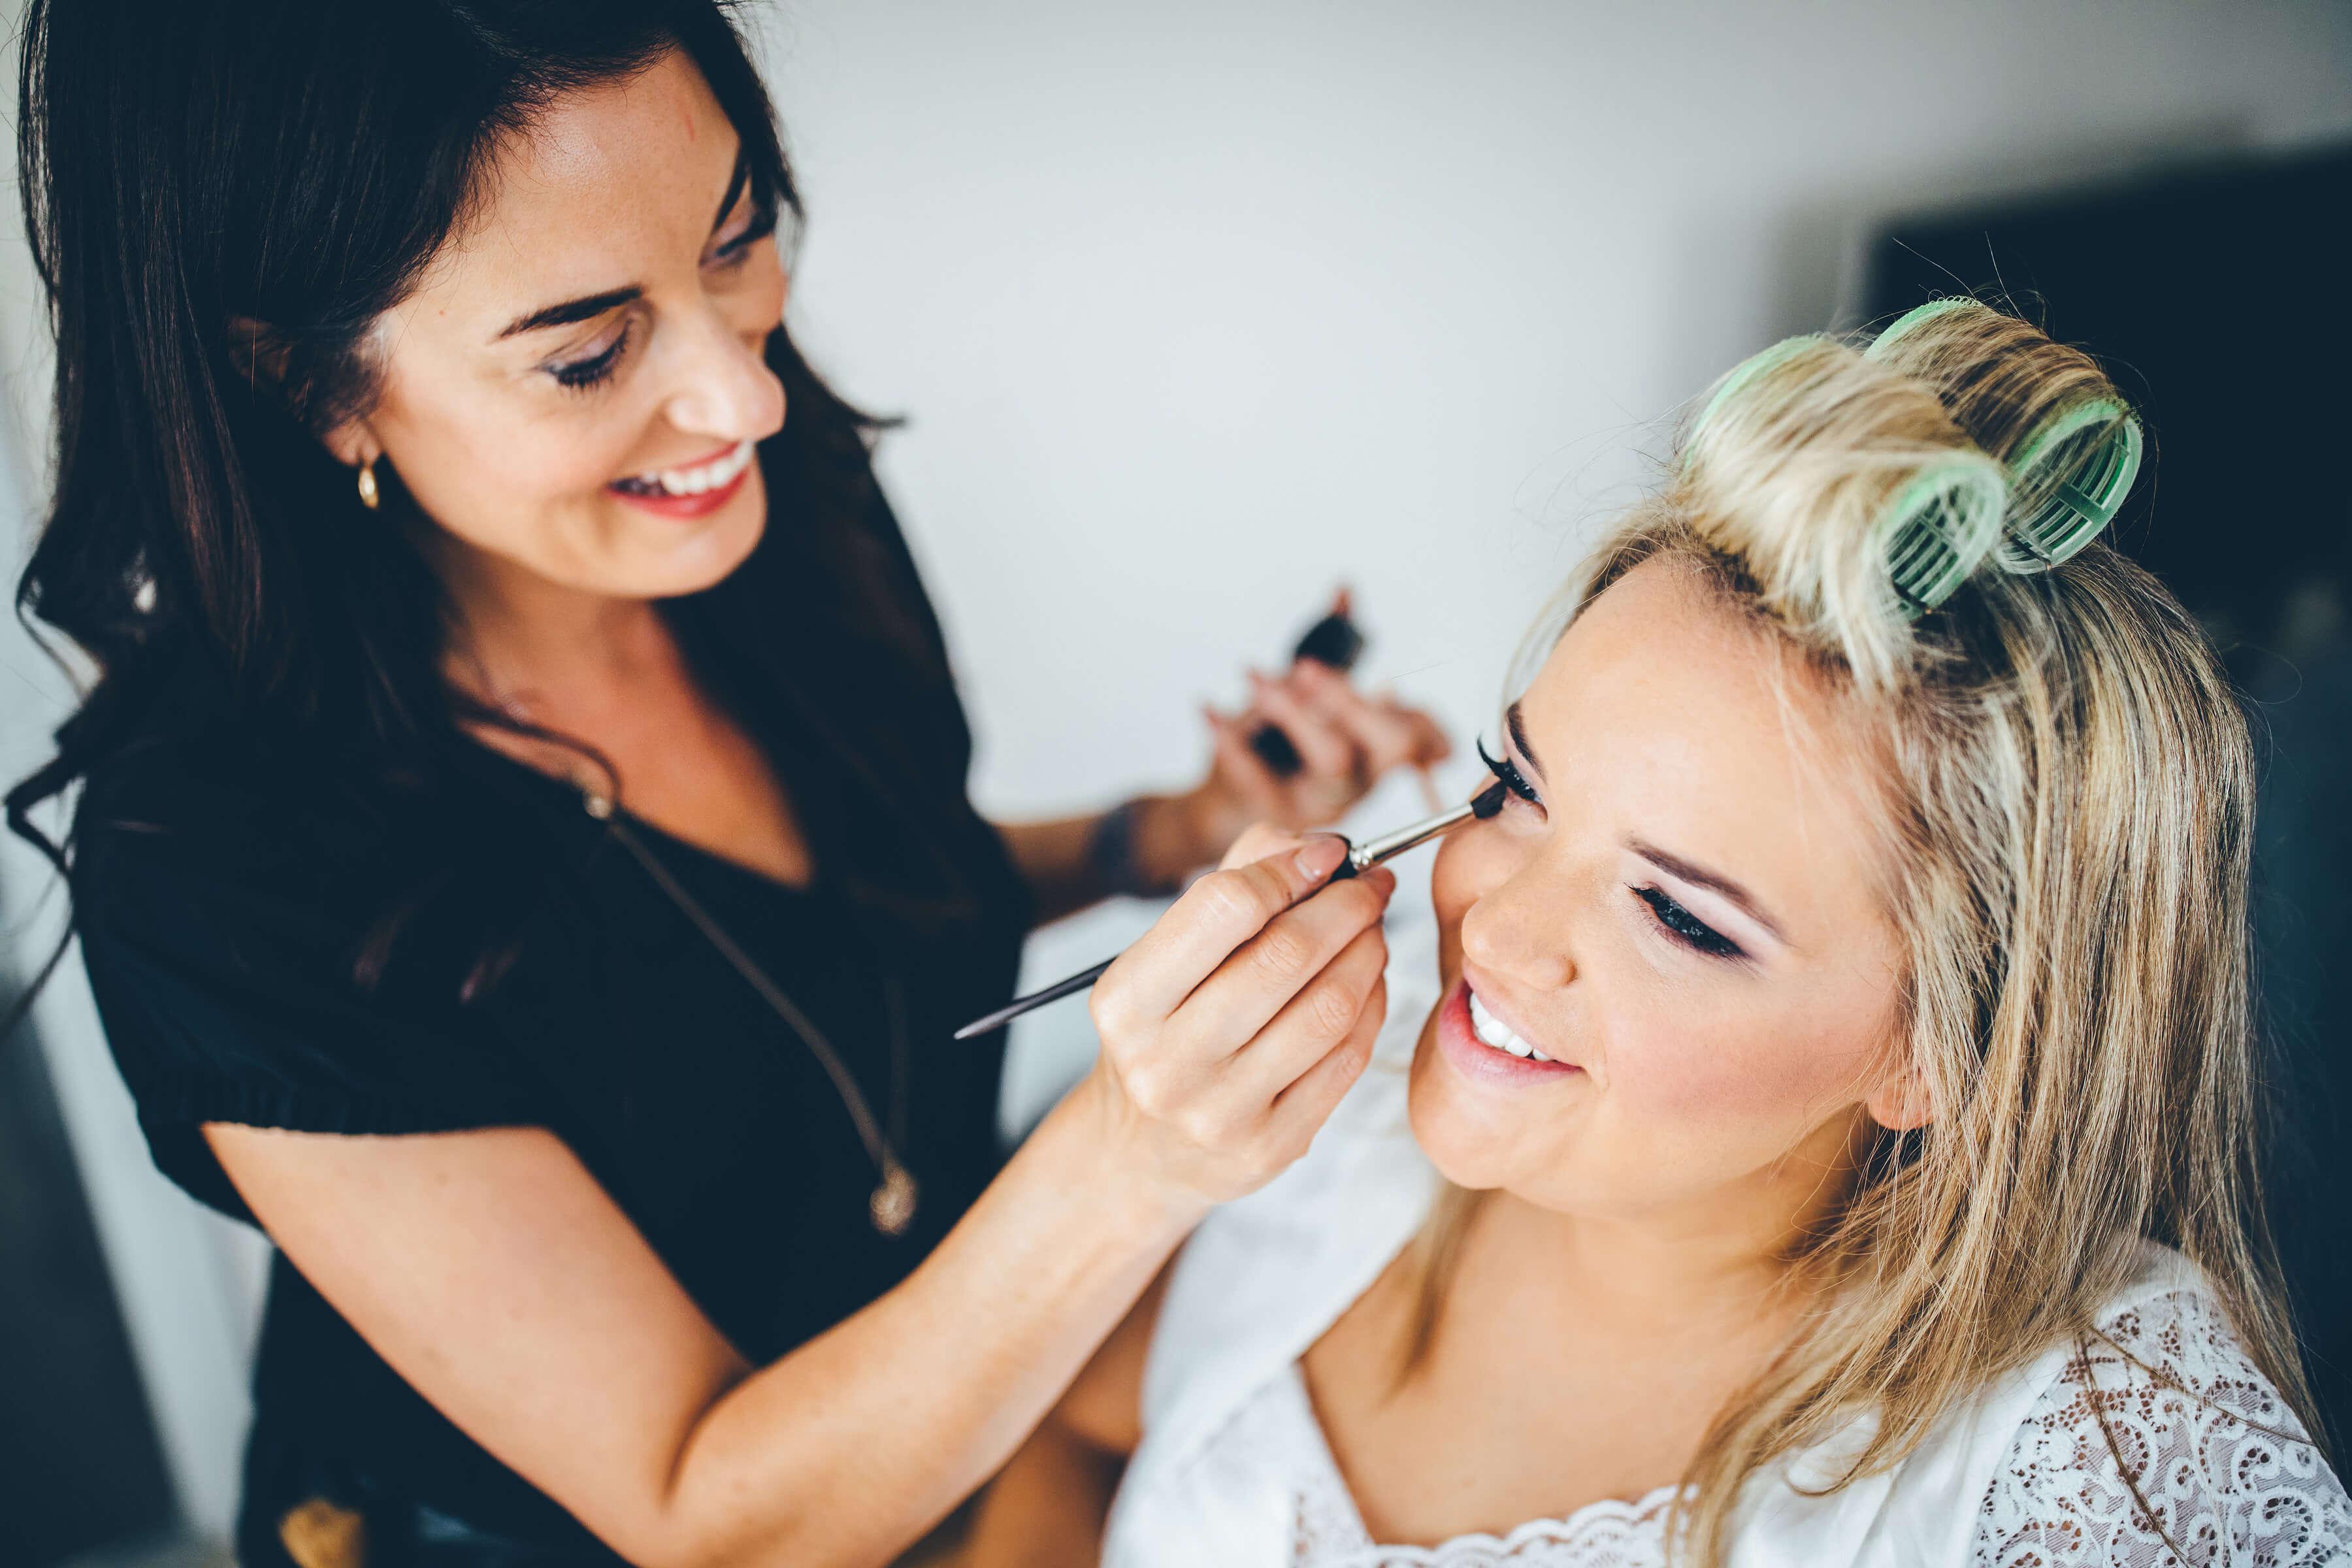 15 beauty gurus reveal their secrets for flawless wedding makeup